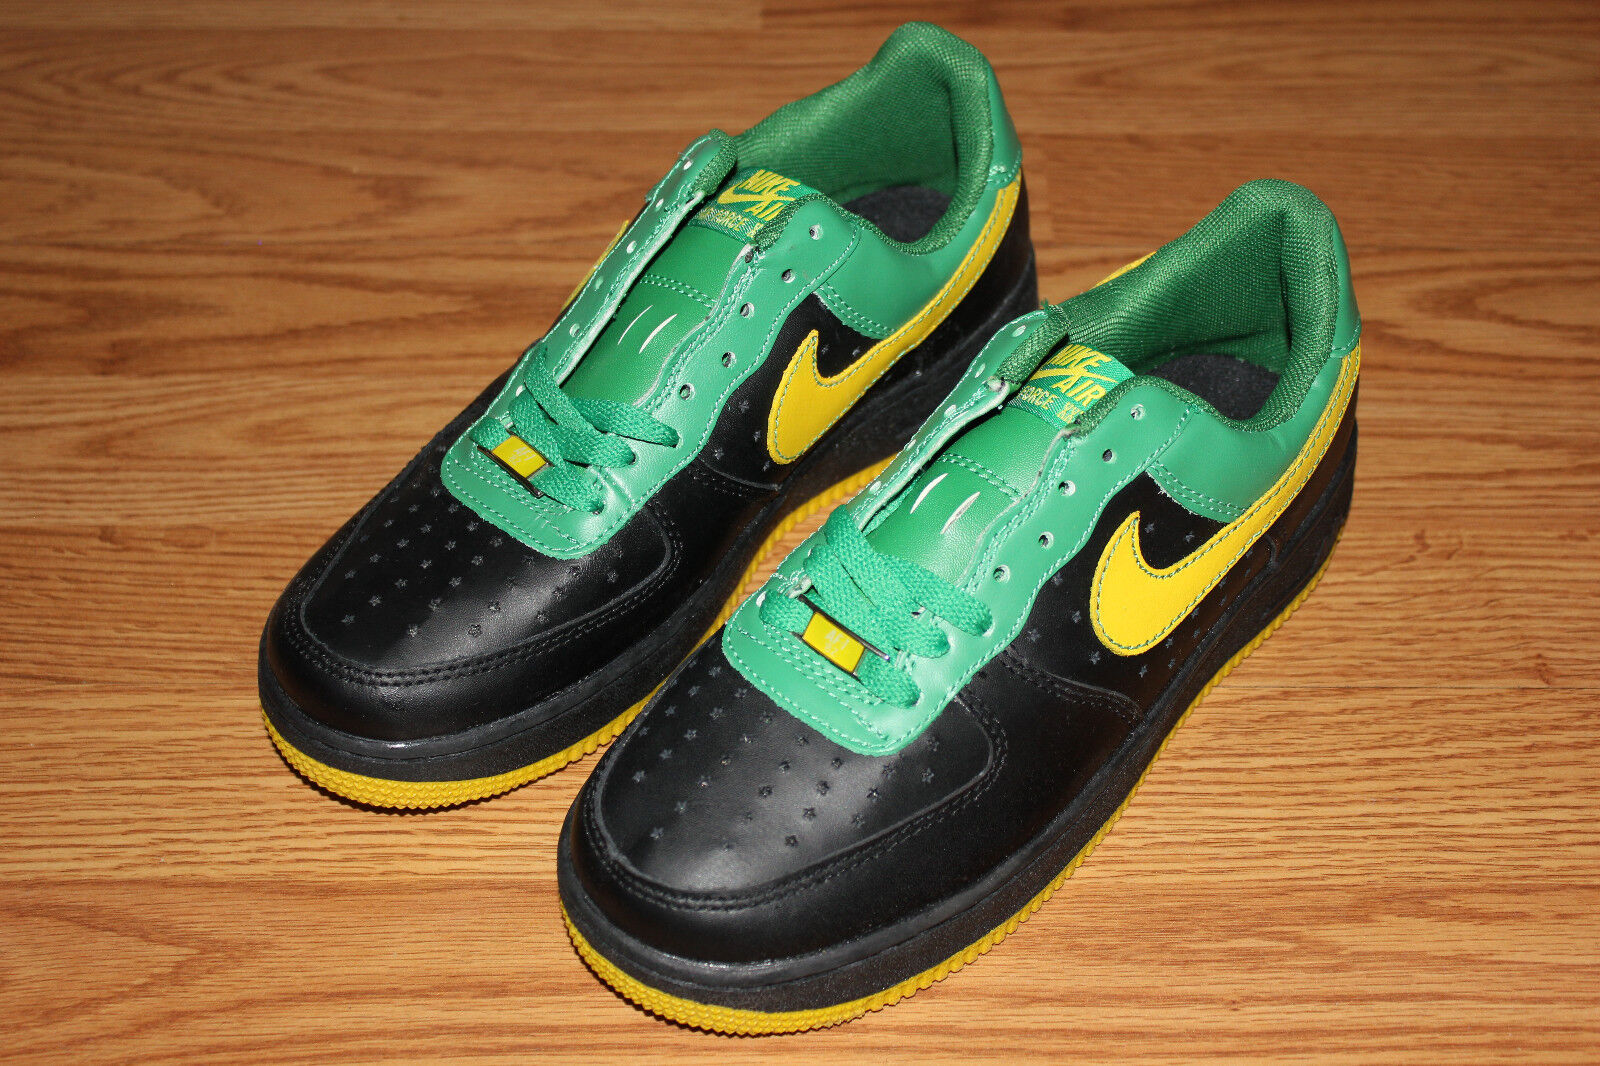 2007 Nike Air Force 1 AF-1 XXV Low Premium SIZE 8 BRAND NEW Green   Black